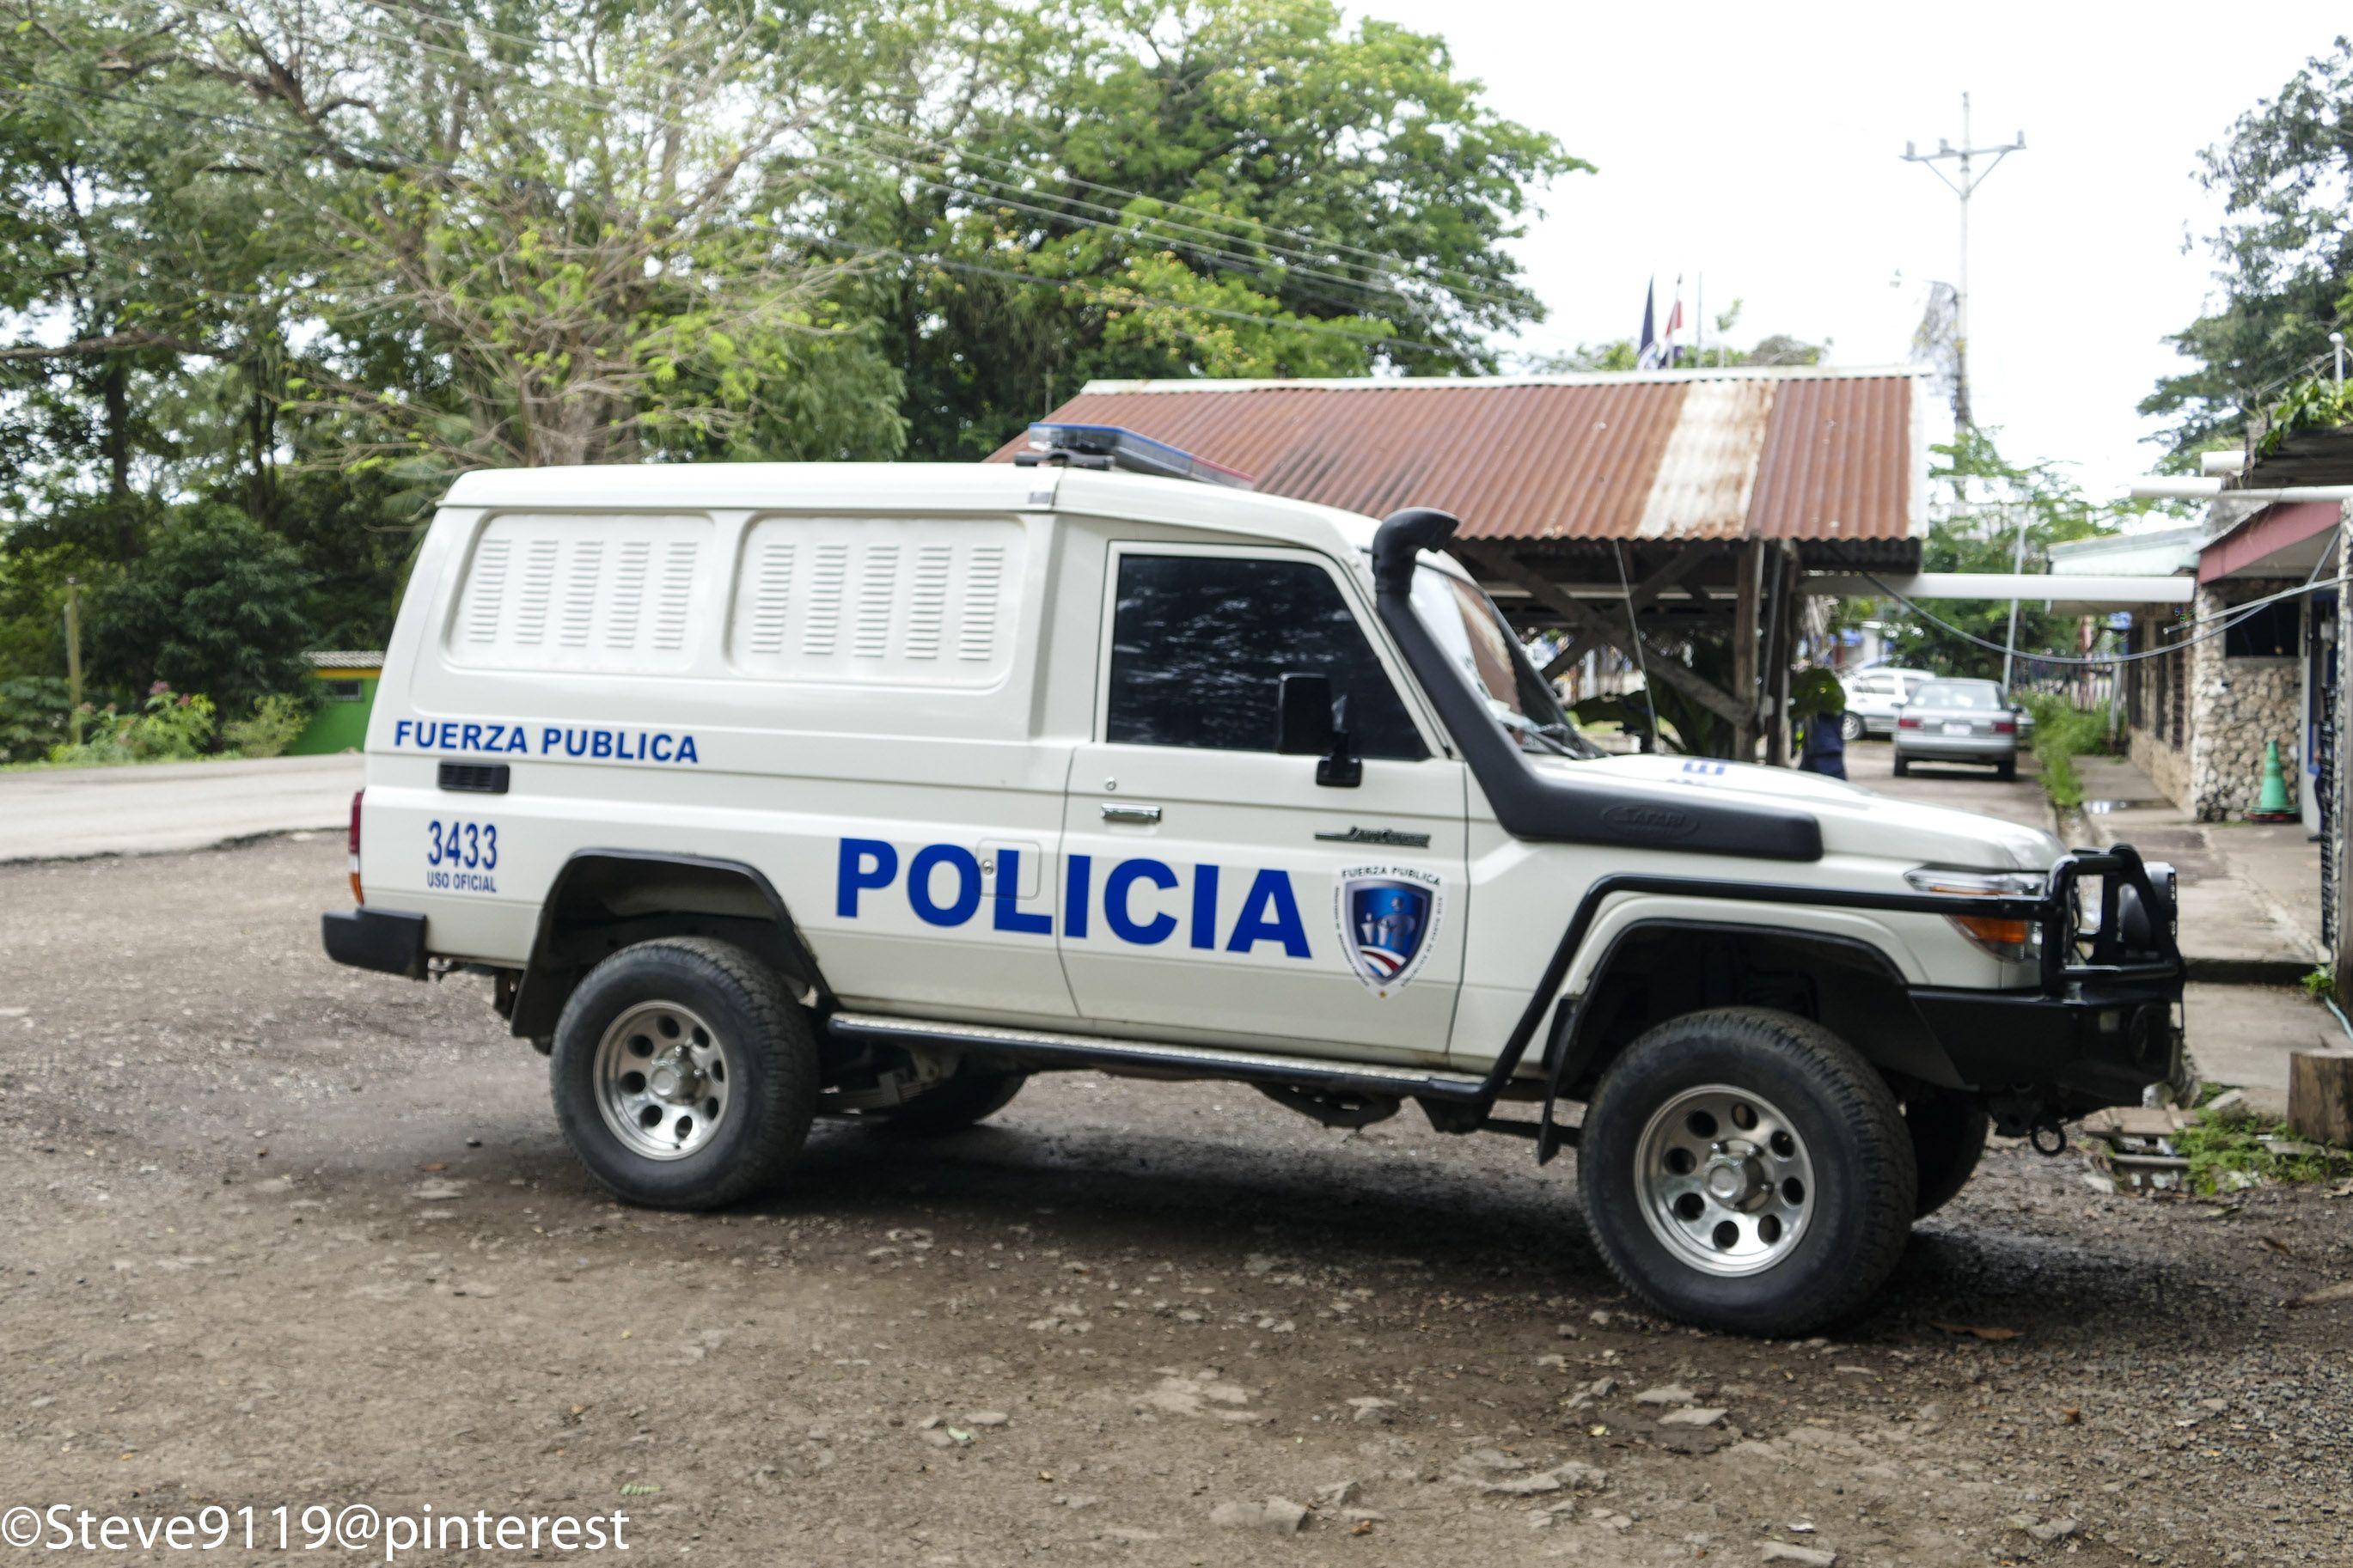 Policia Fuerza Publica Costa Rica Old Police Cars Police